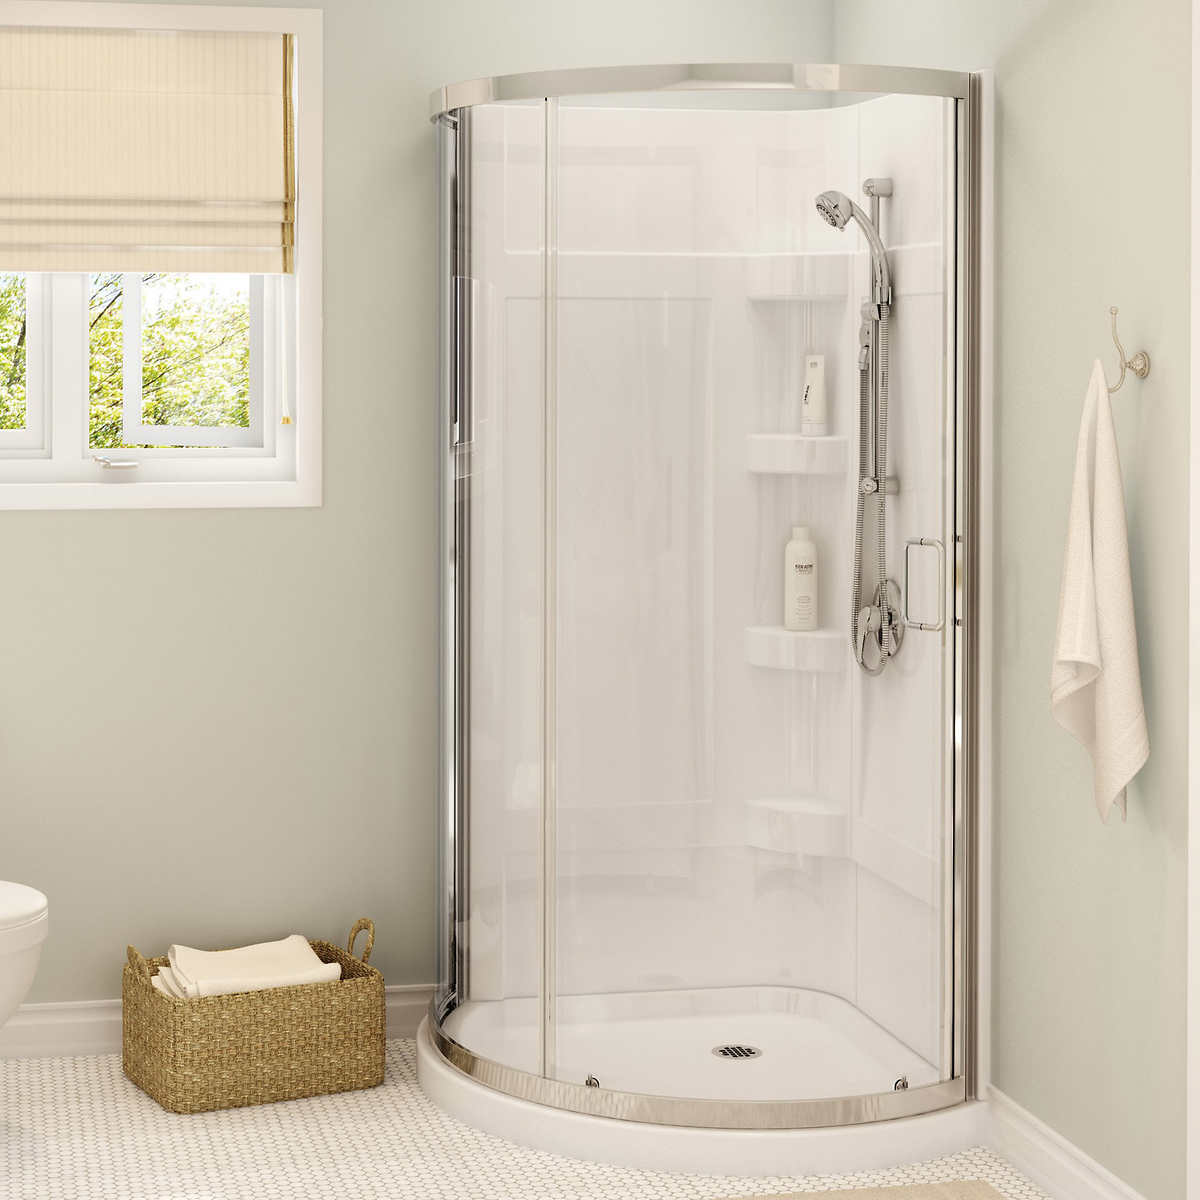 MAAX Athena 34 in. x 42 in. Corner Shower Kit